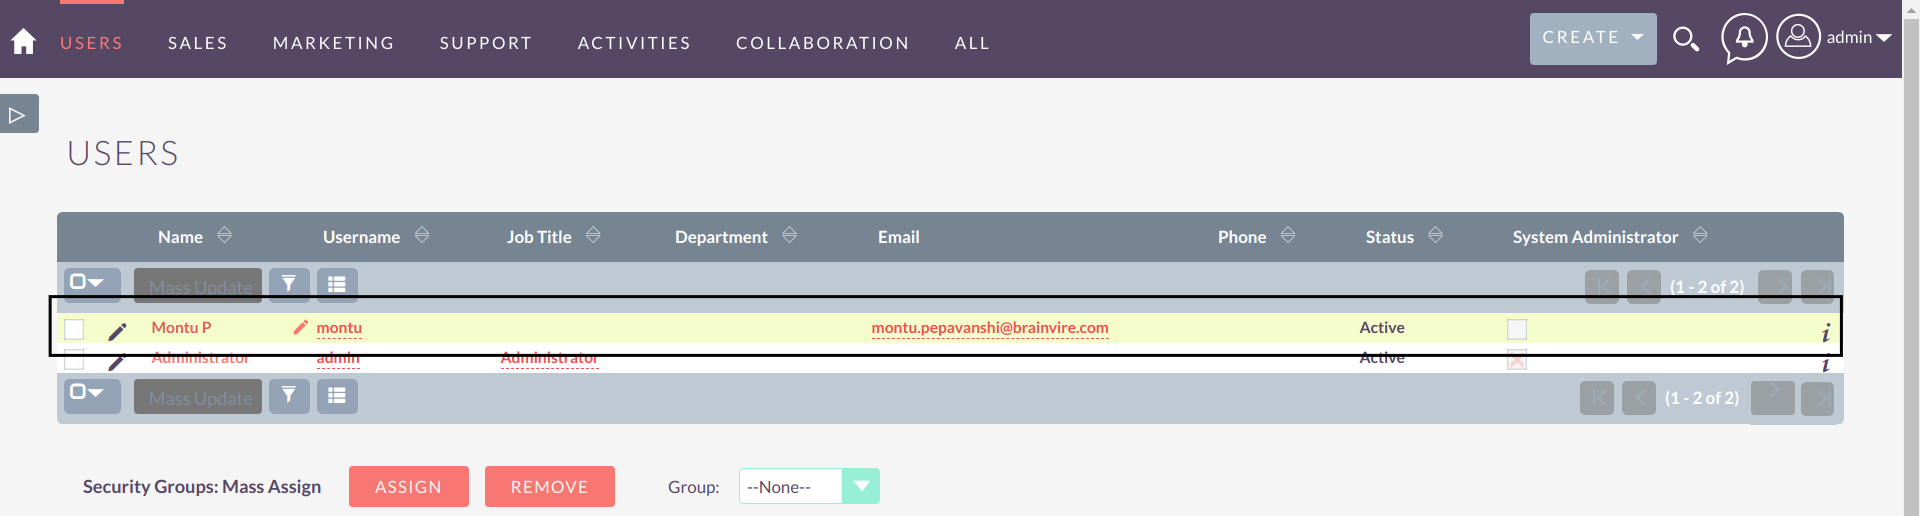 Sudo Login for SuiteCRM choose user to login as